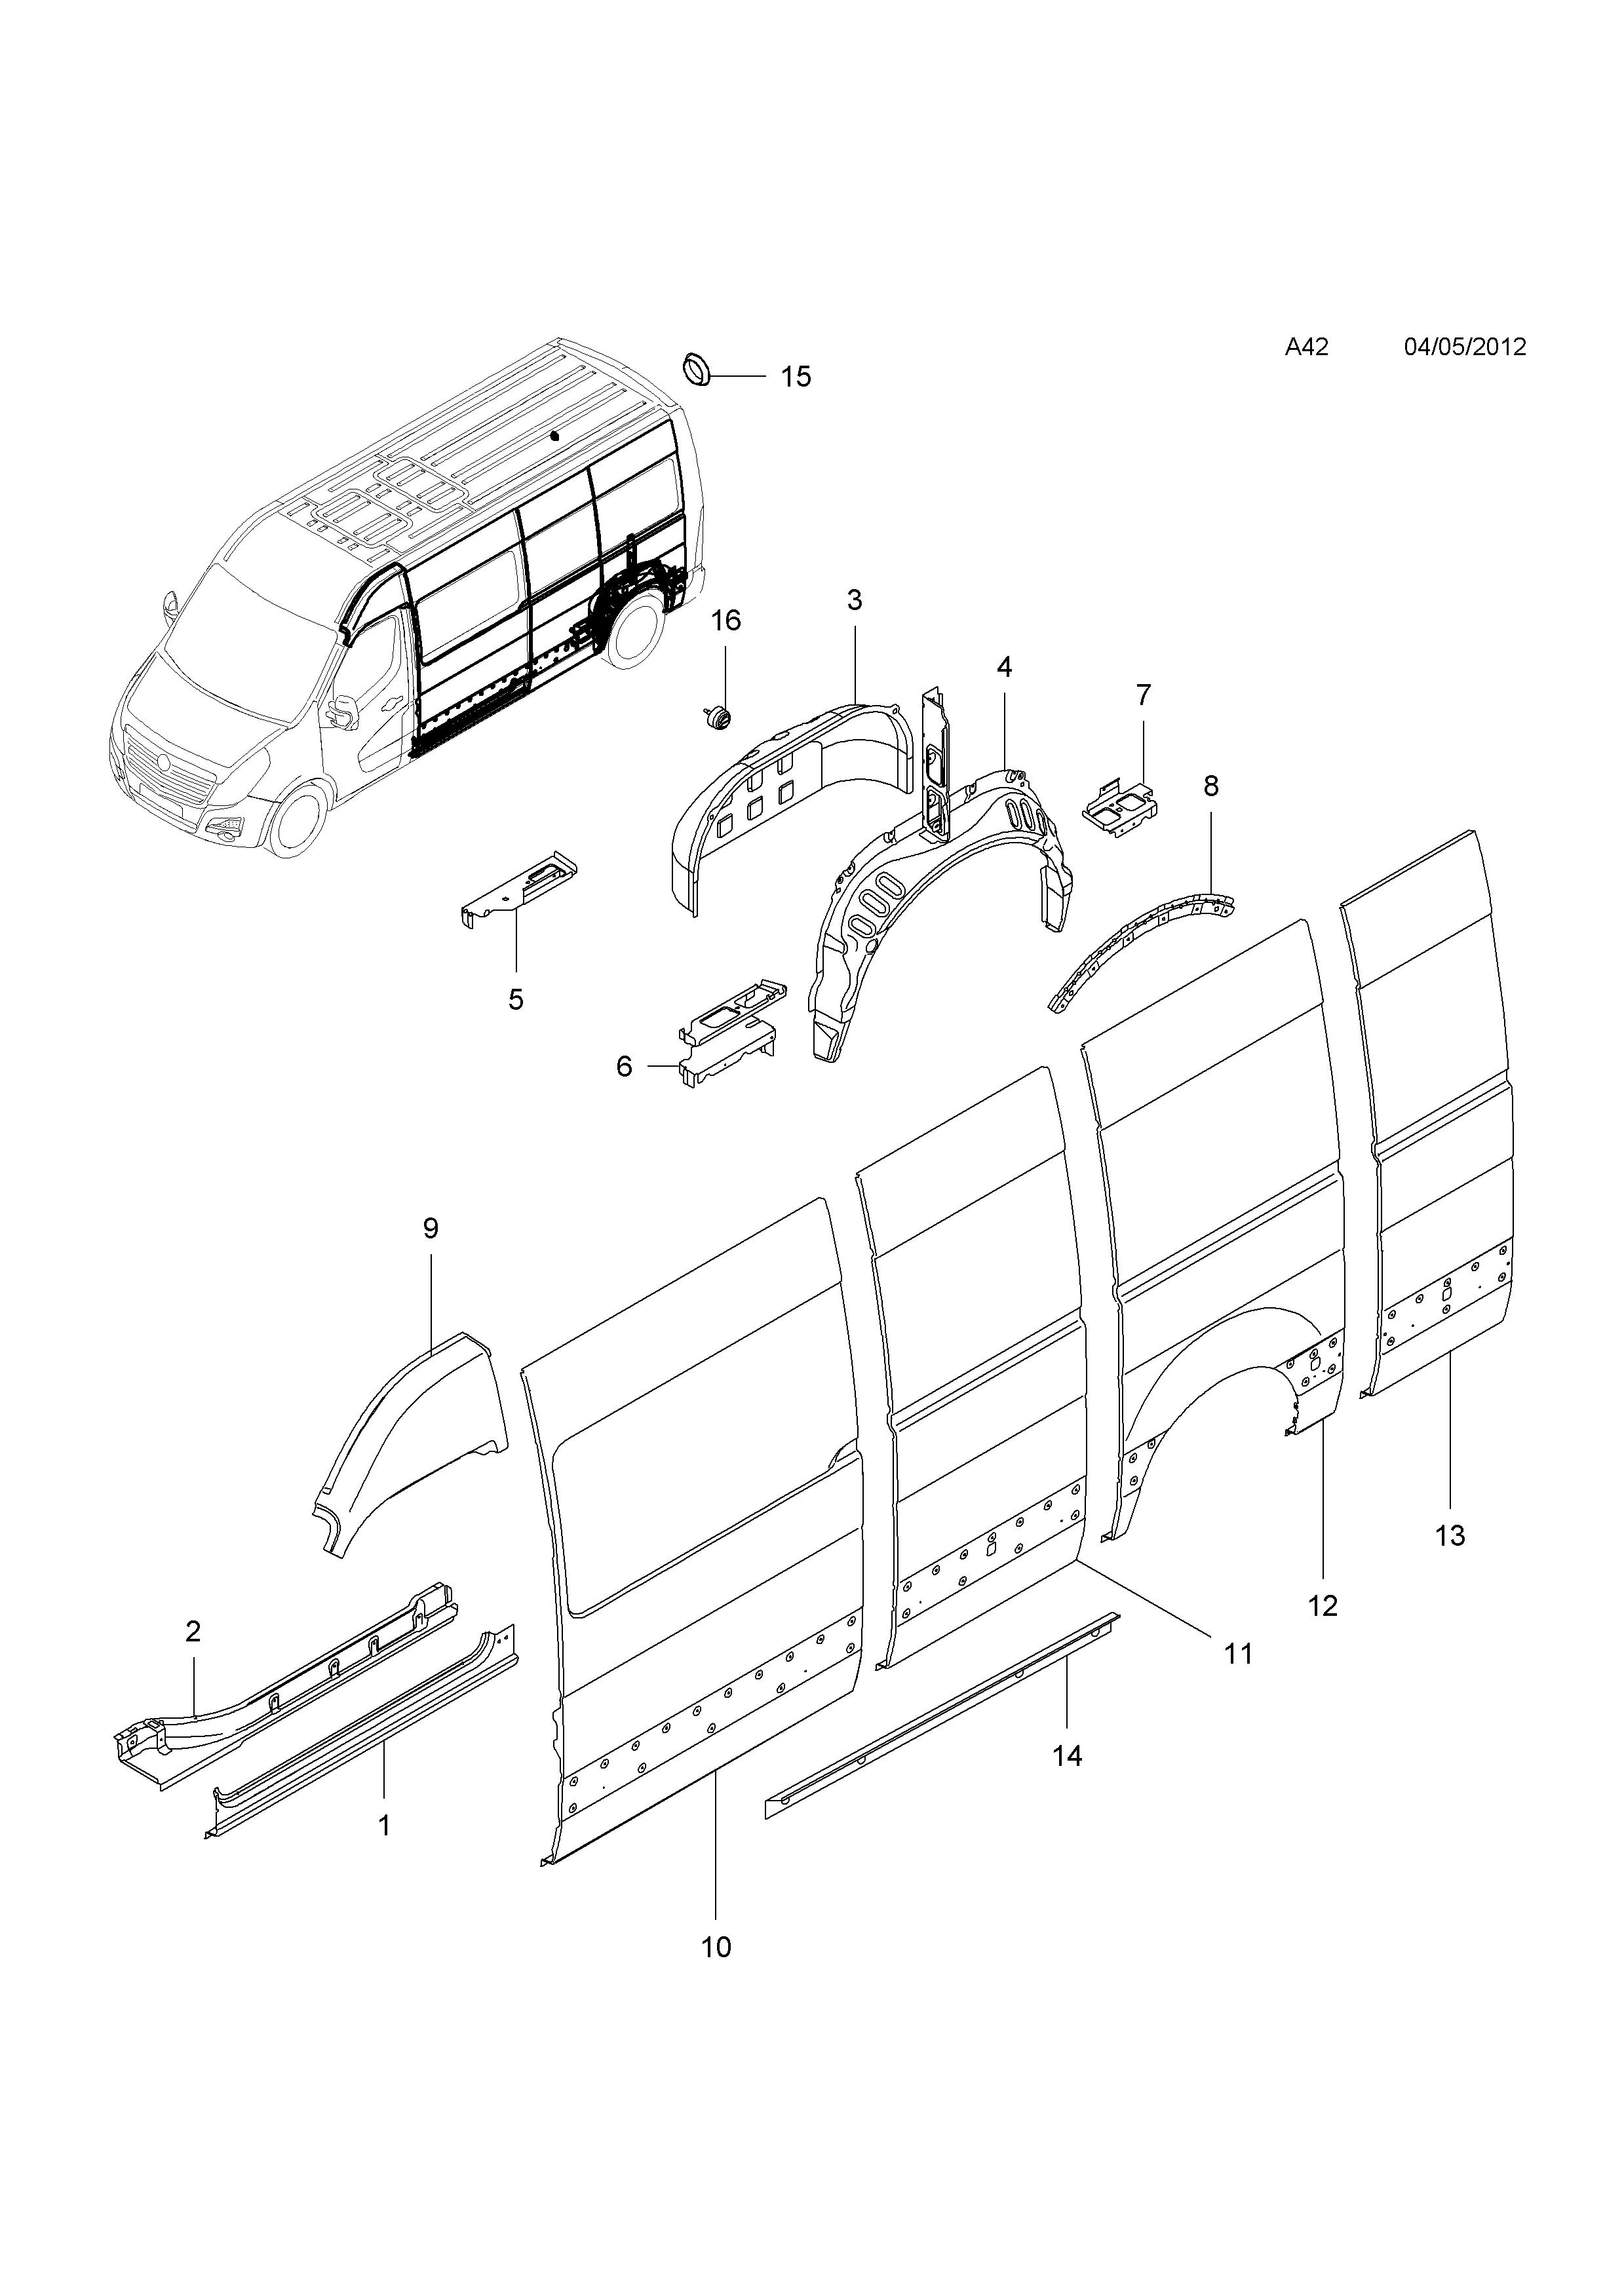 2014 corvette stingray engine specs